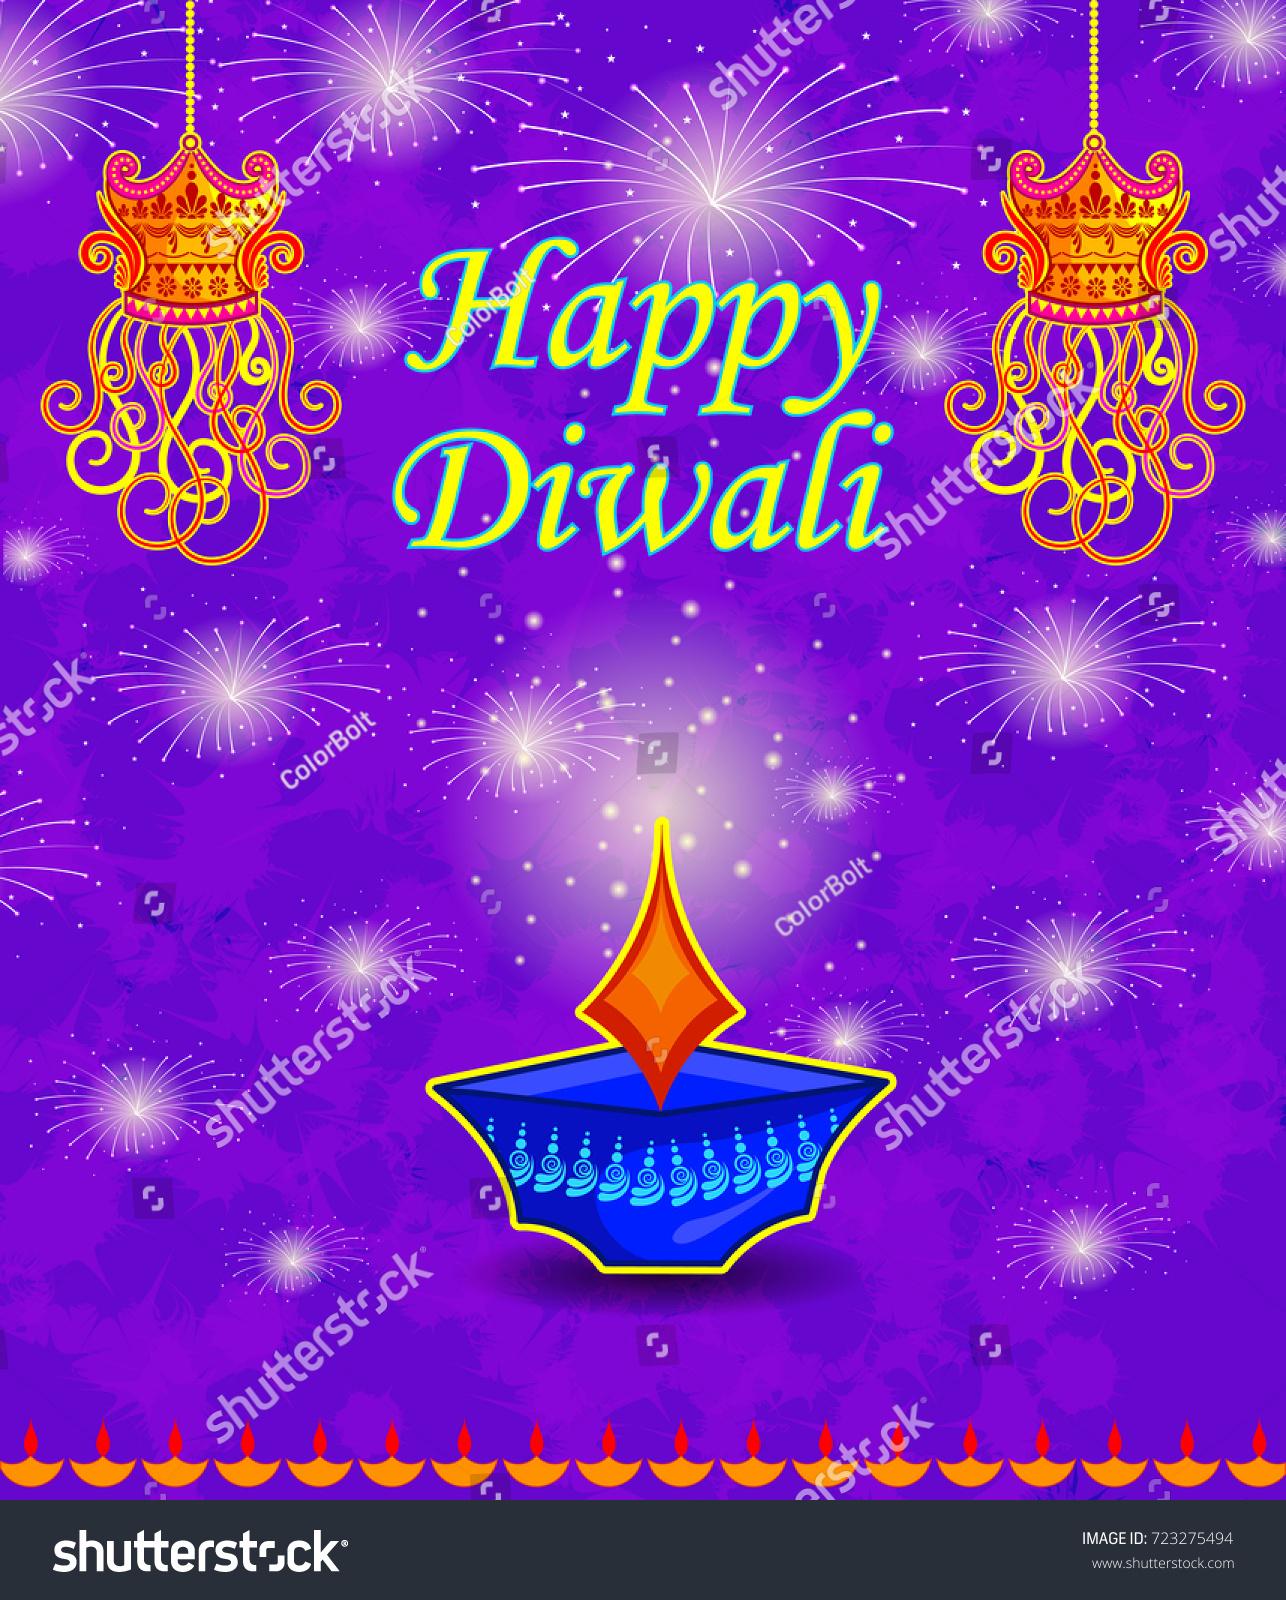 Happy Diwali Light Festival India Greeting Stock Vector Royalty